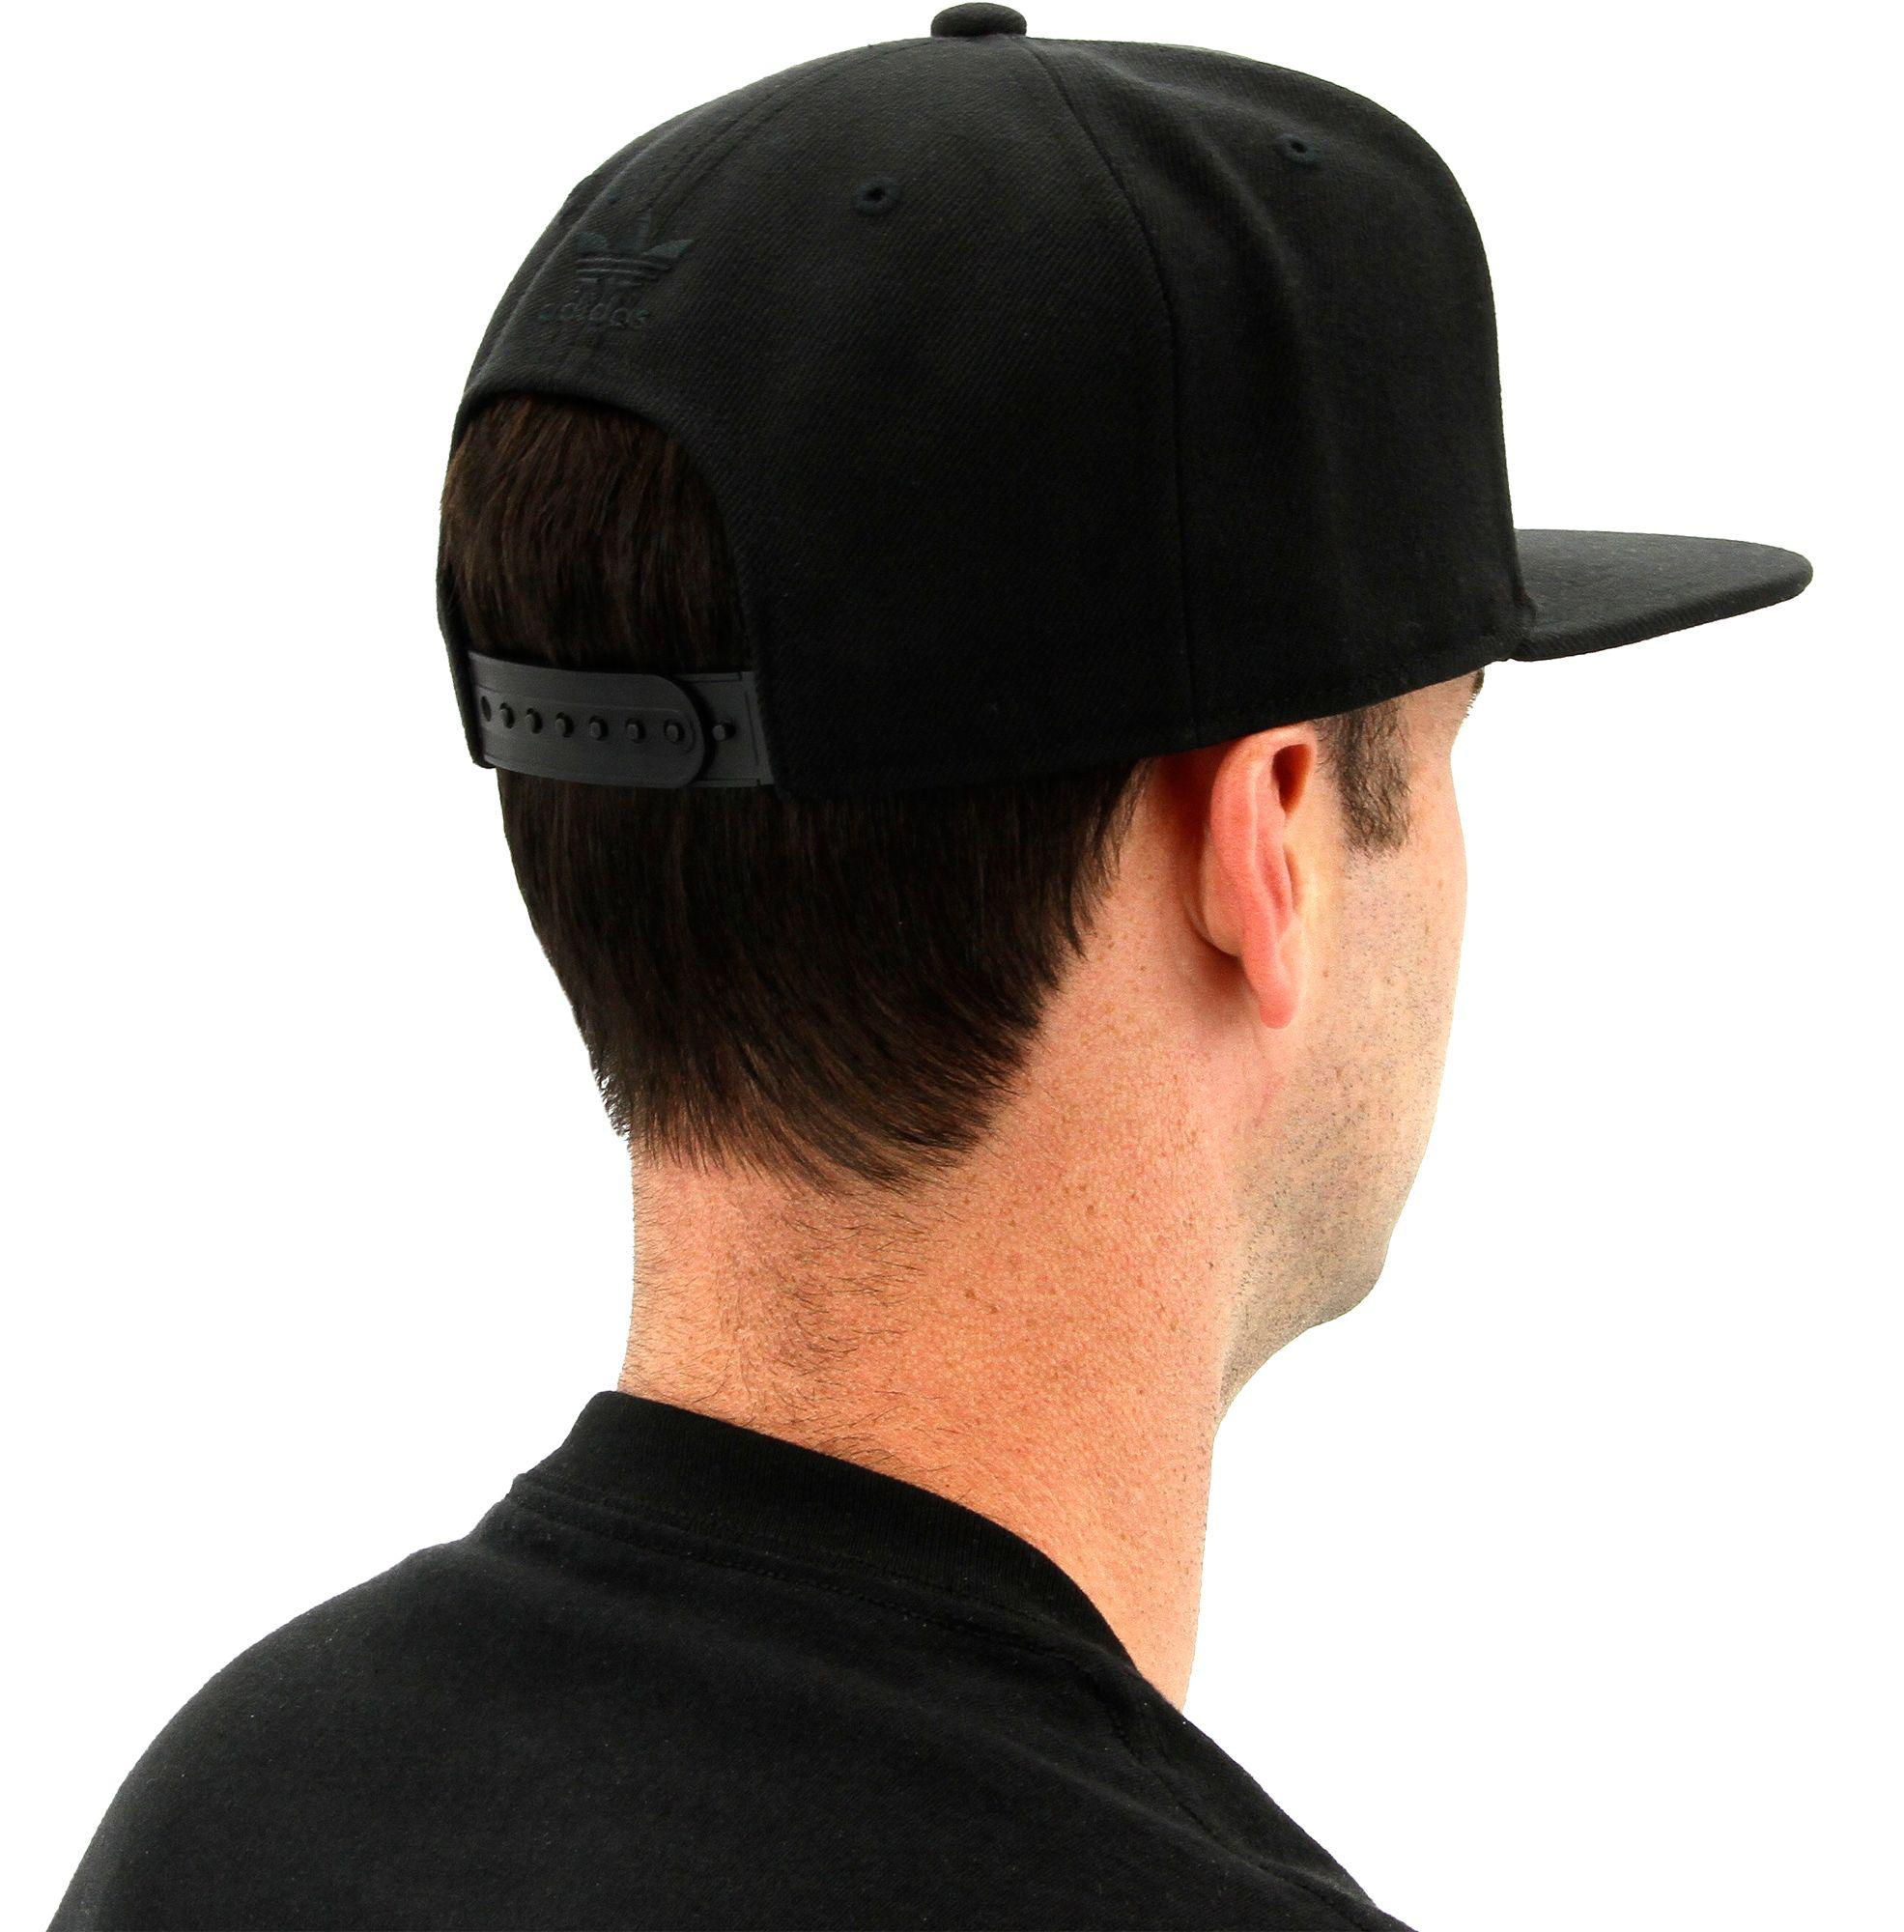 705a9ec085687 adidas Originals Trefoil Chain Snapback Hat in Black for Men - Lyst